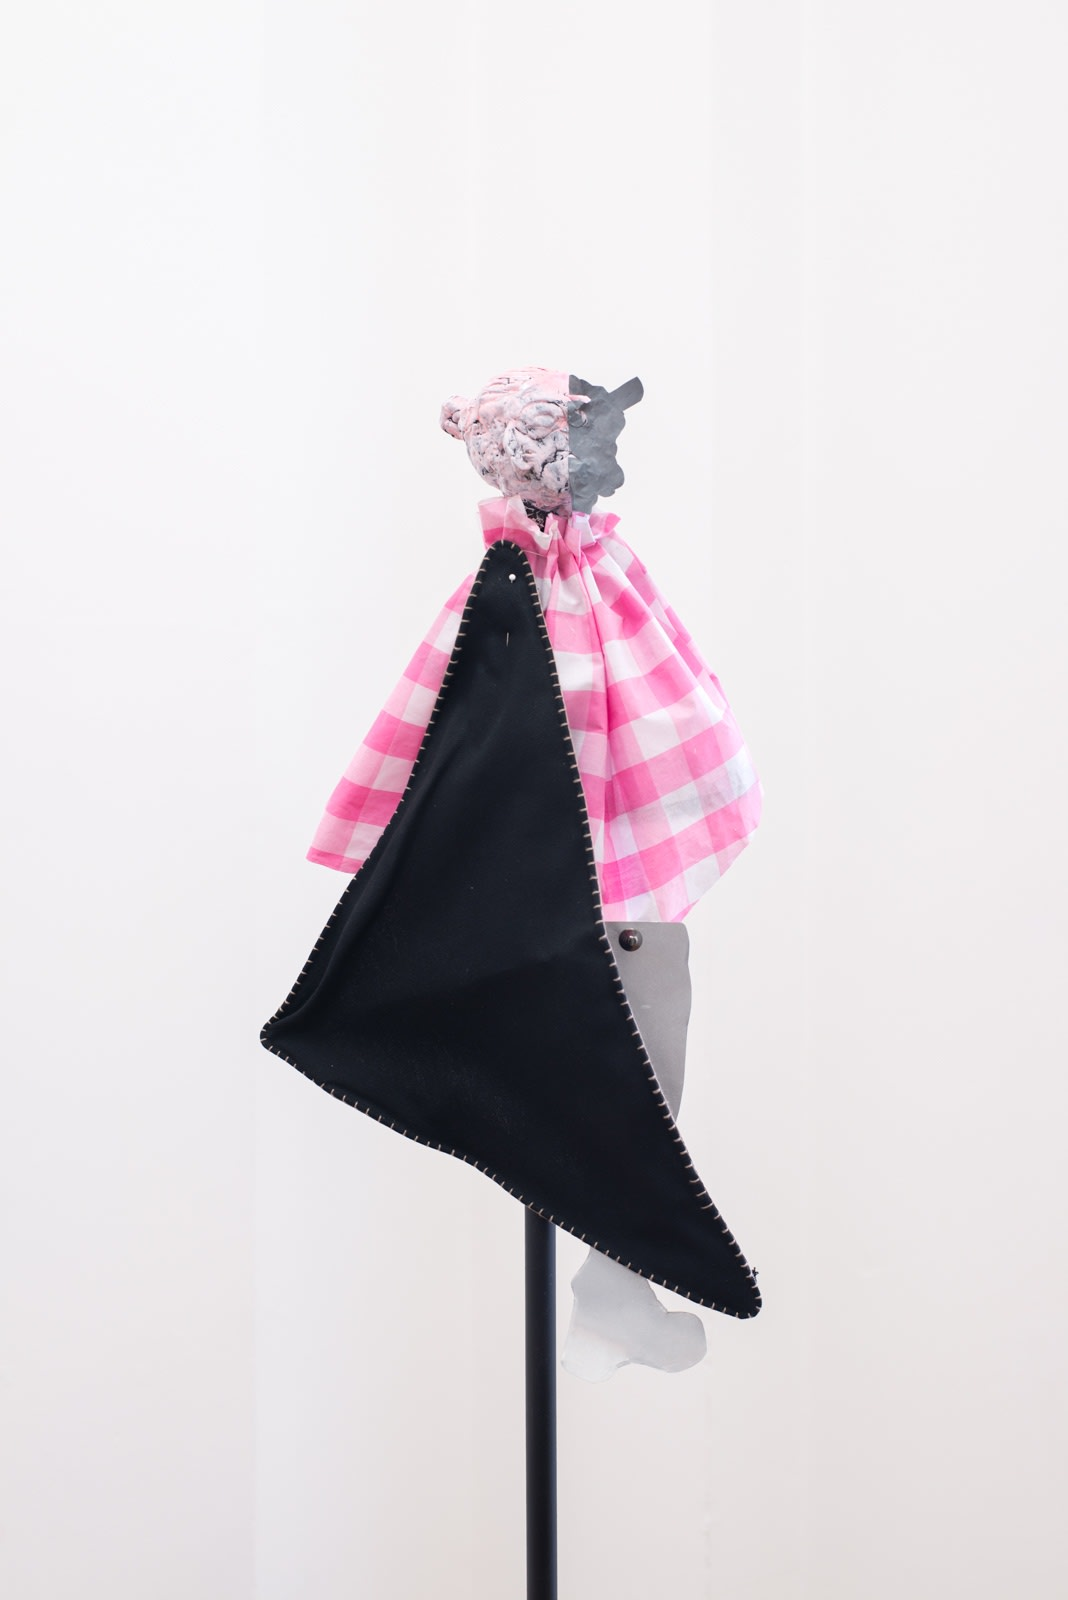 Sally Smart, Punokawan Puppet, 2017